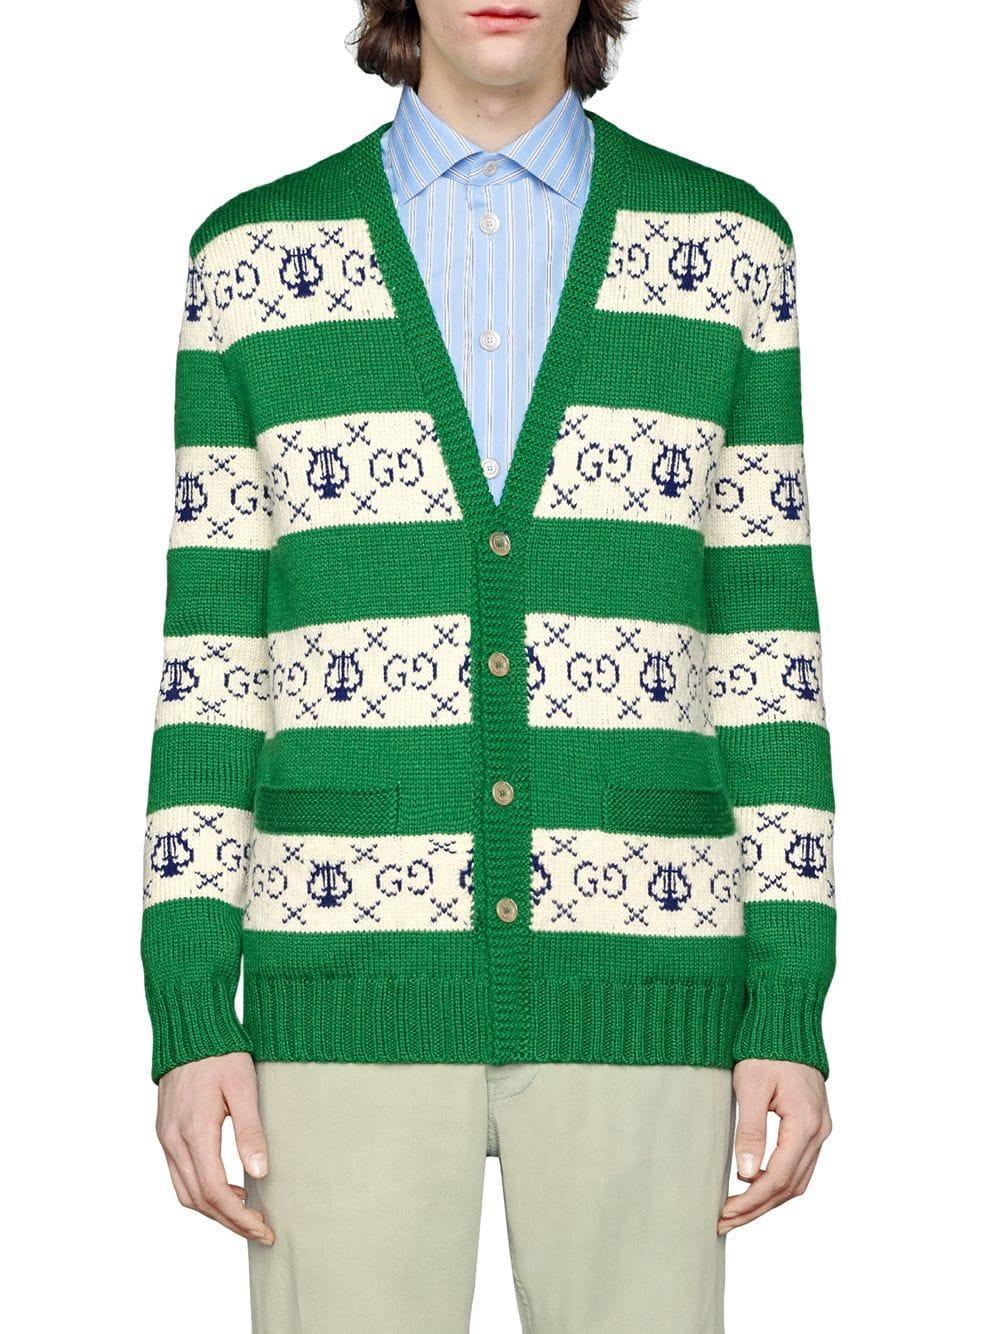 fd1f3b4396 Gucci GG Lyre Striped Jacquard Cardigan in Green for Men - Lyst